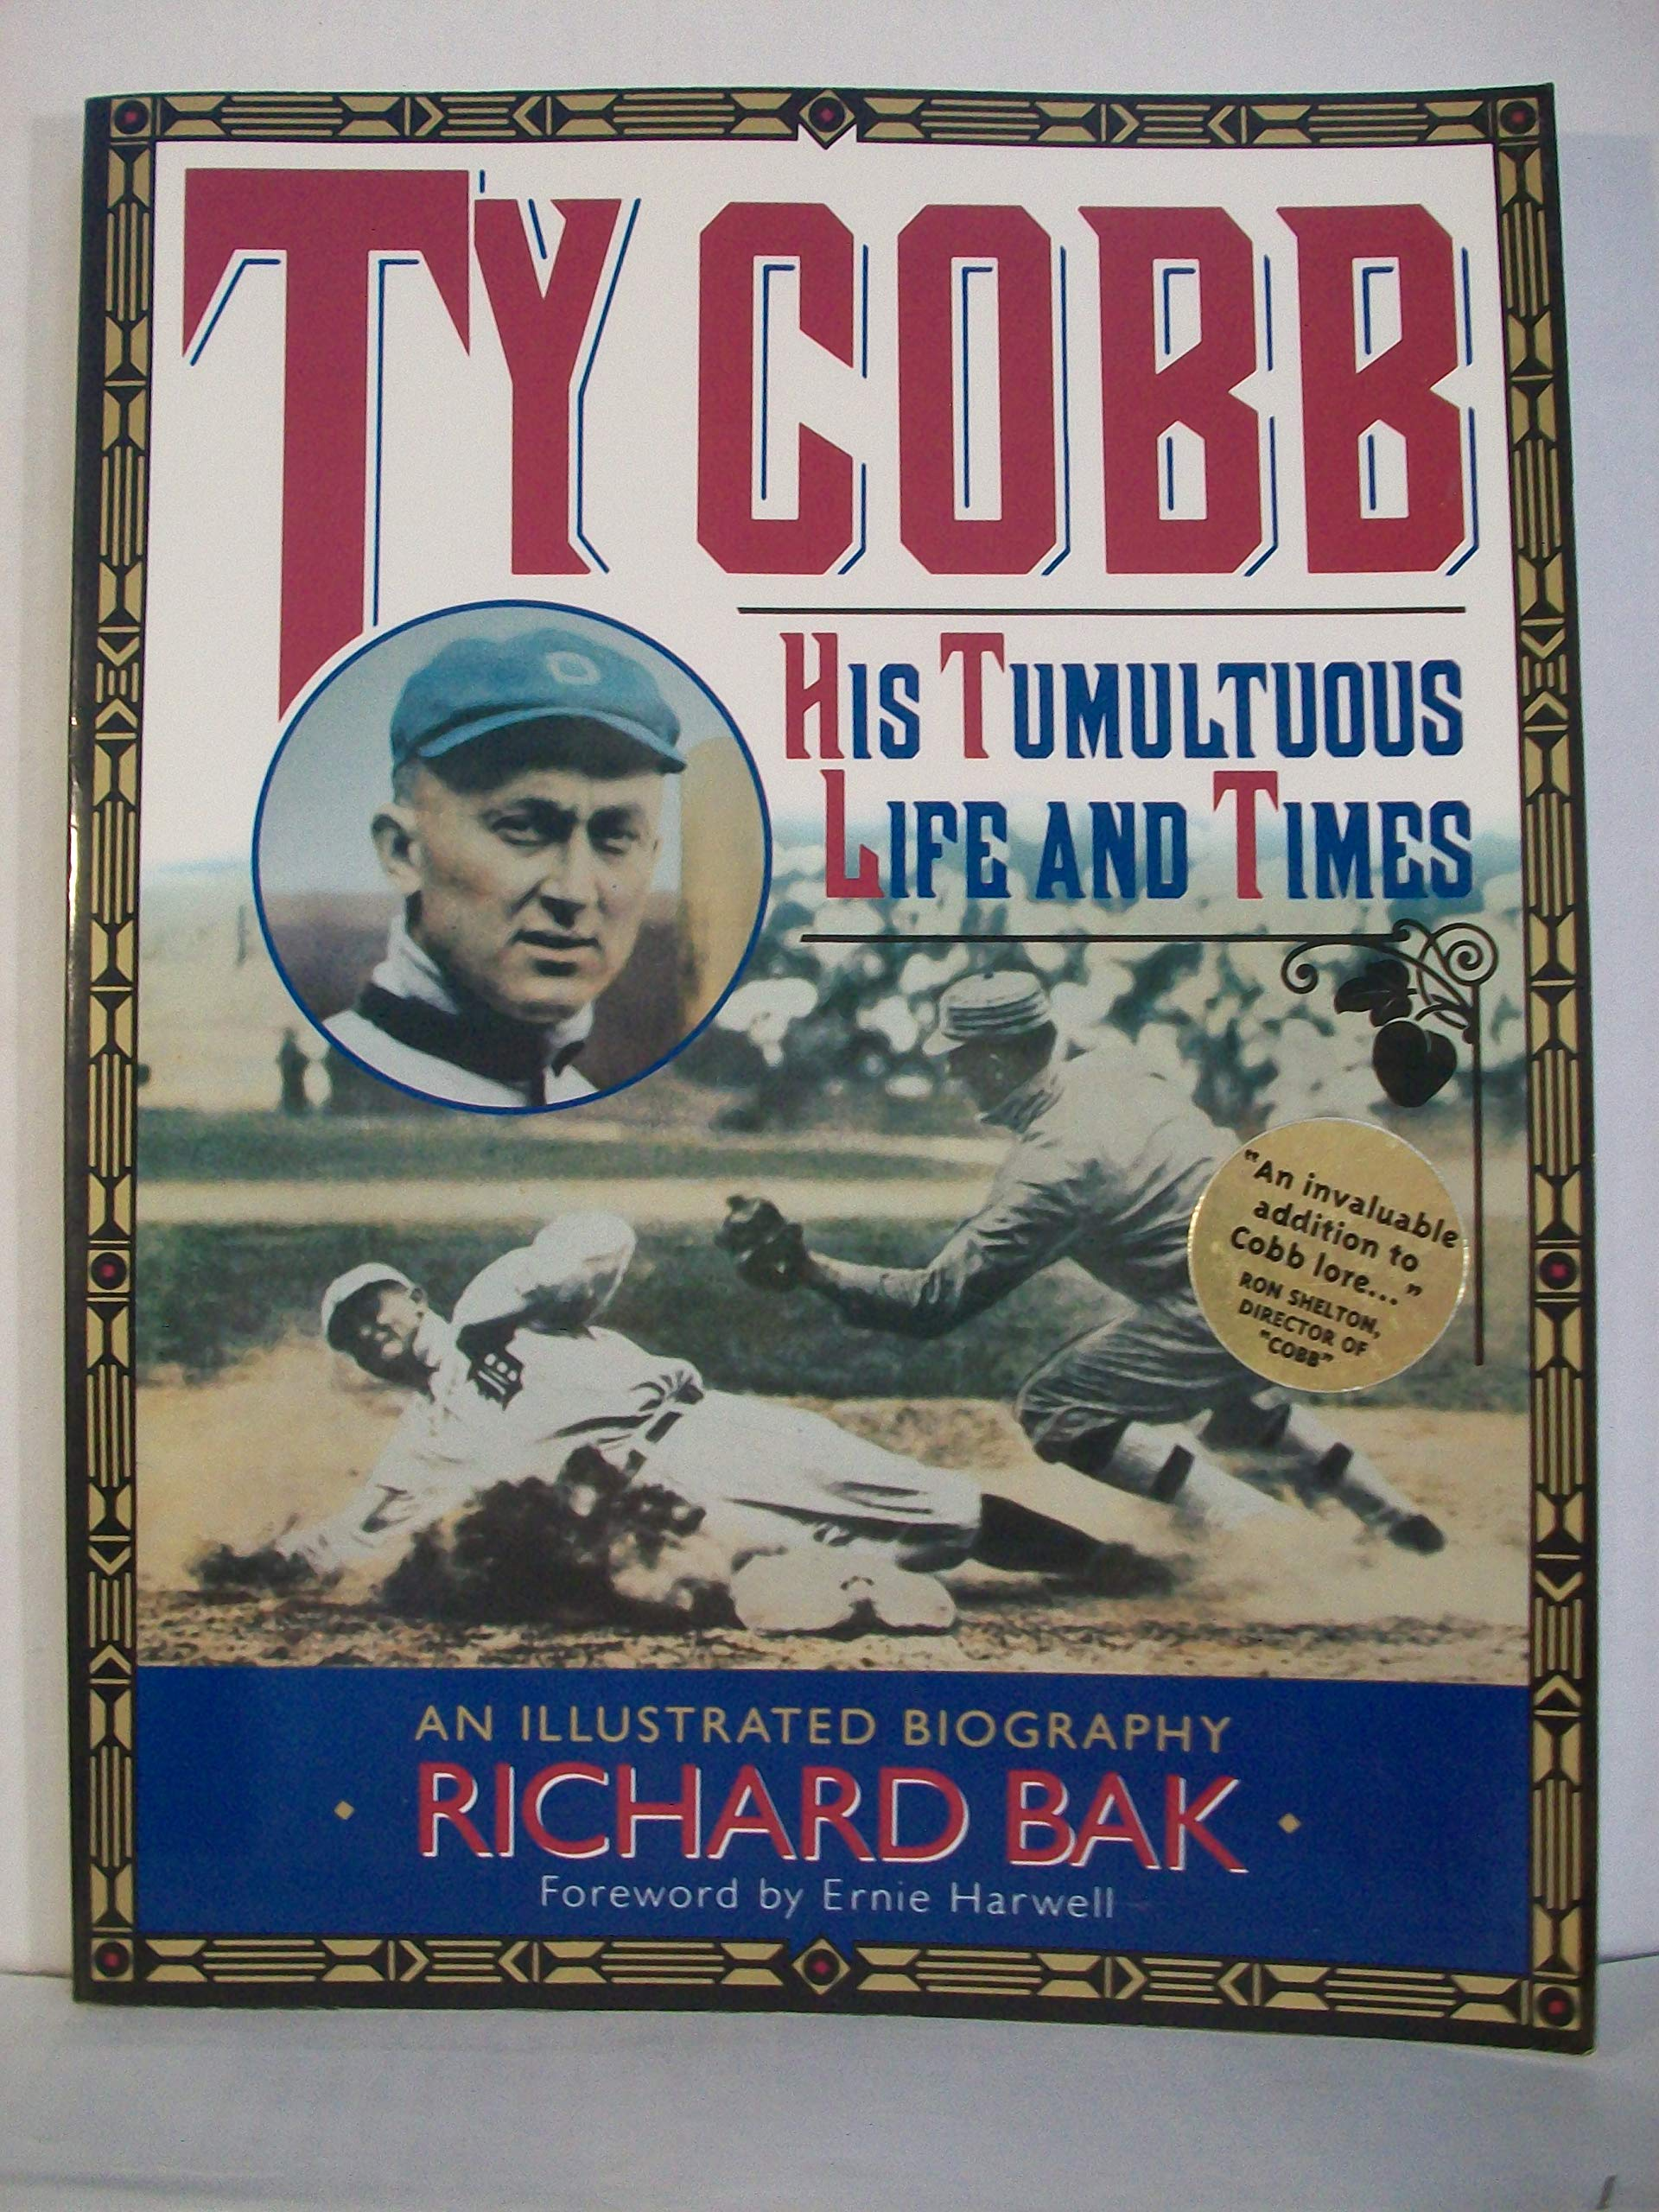 Ty Cobb: His Tumultuous Life and Times: Amazon.es: Bak ...